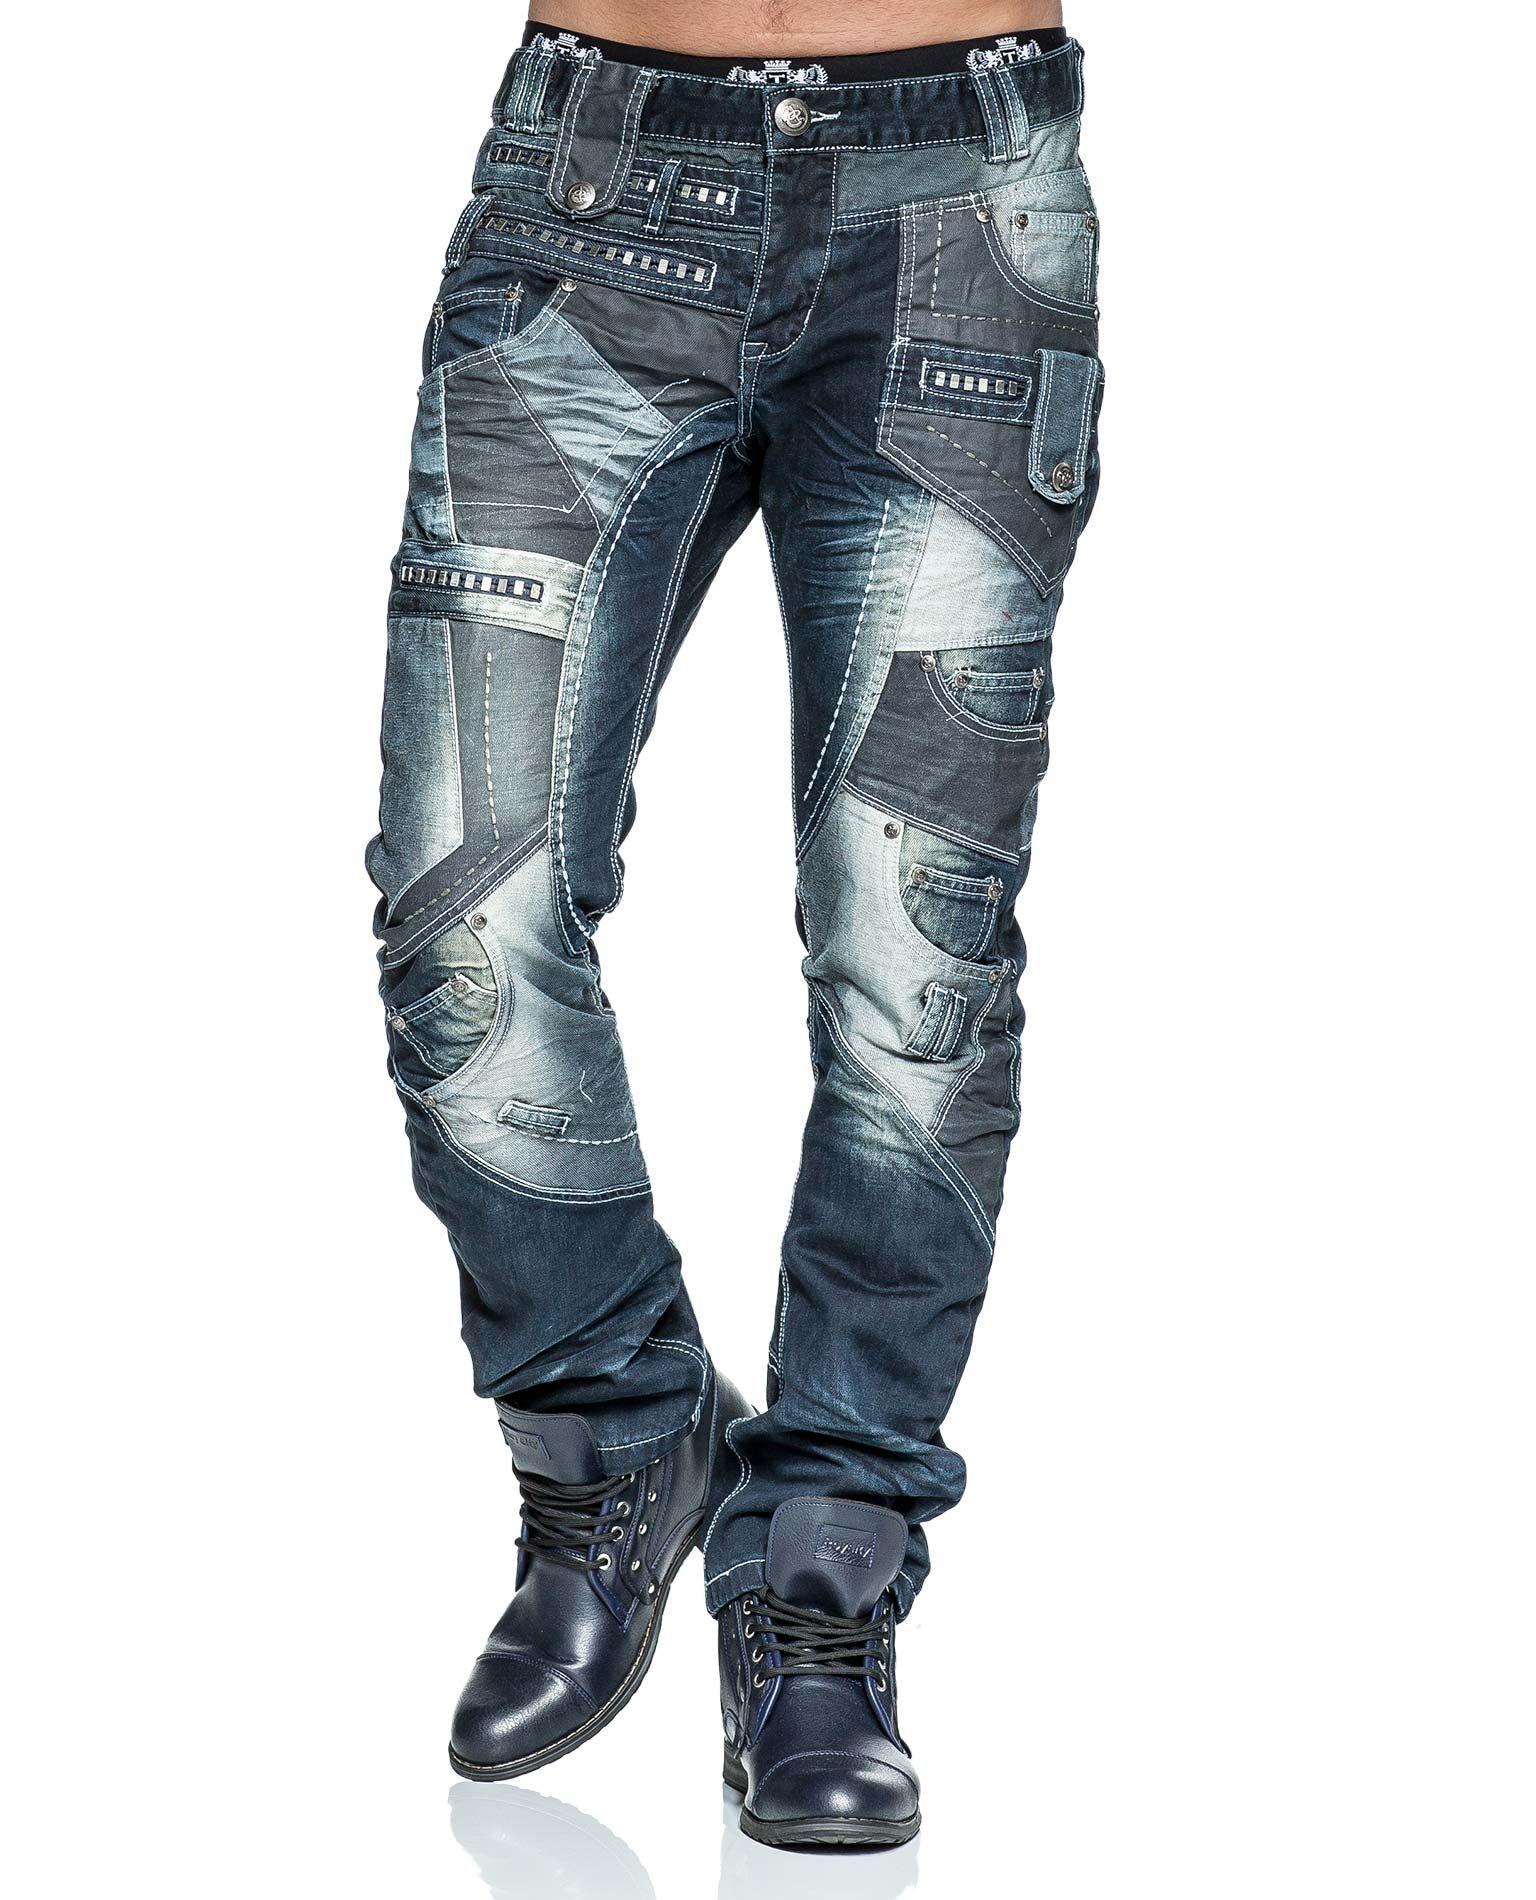 87748b69976bb JAPRAG dark blue jeans. Bold details. Decorative pockets